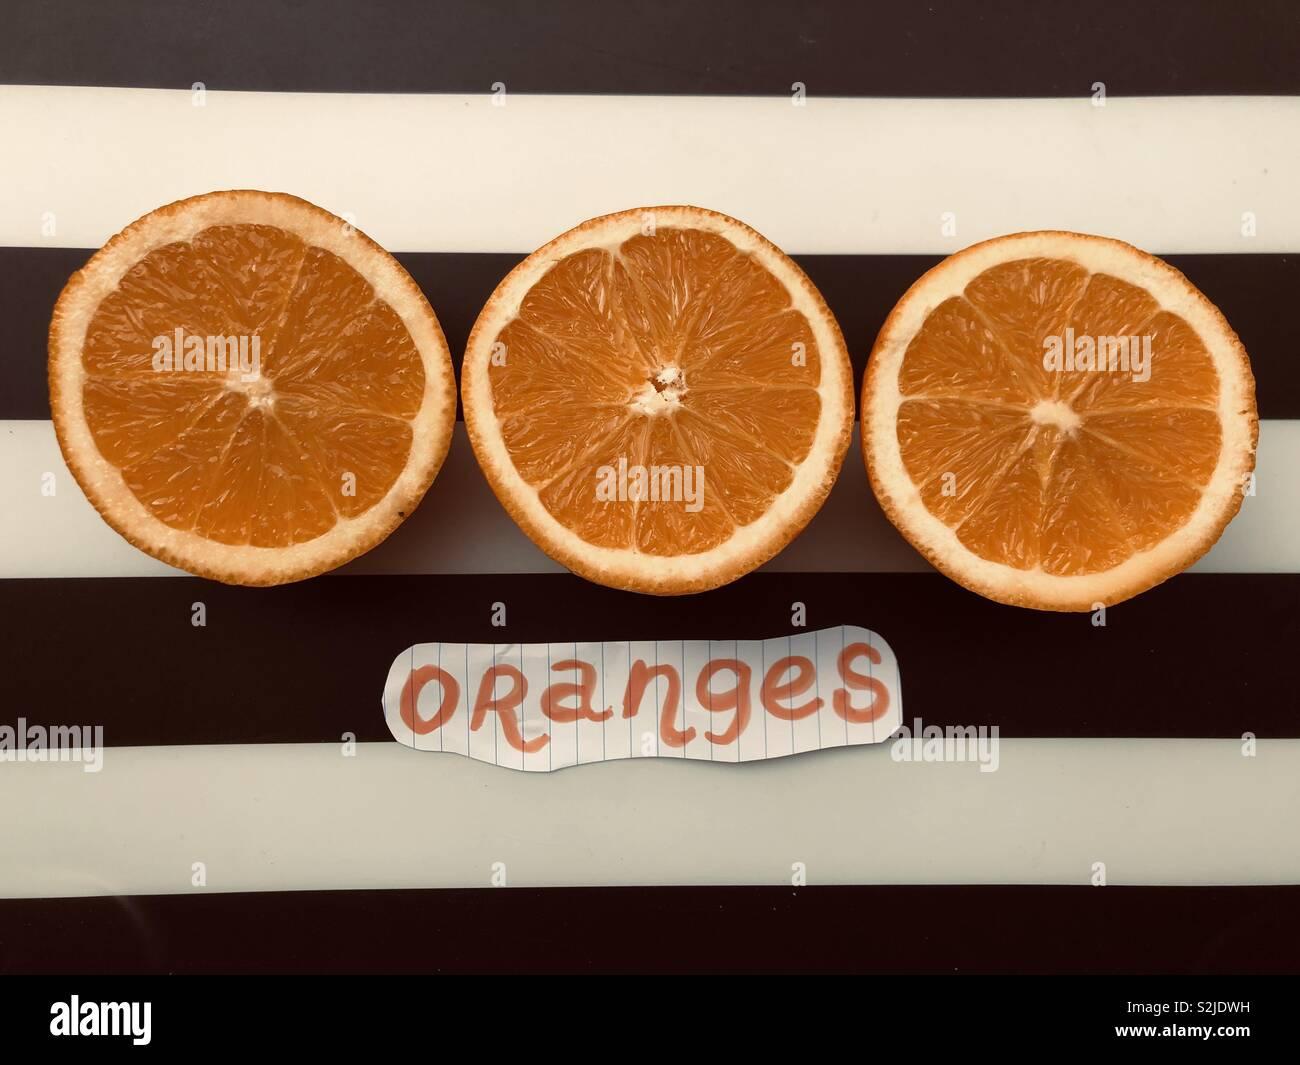 Three oranges against black and white background - Stock Image